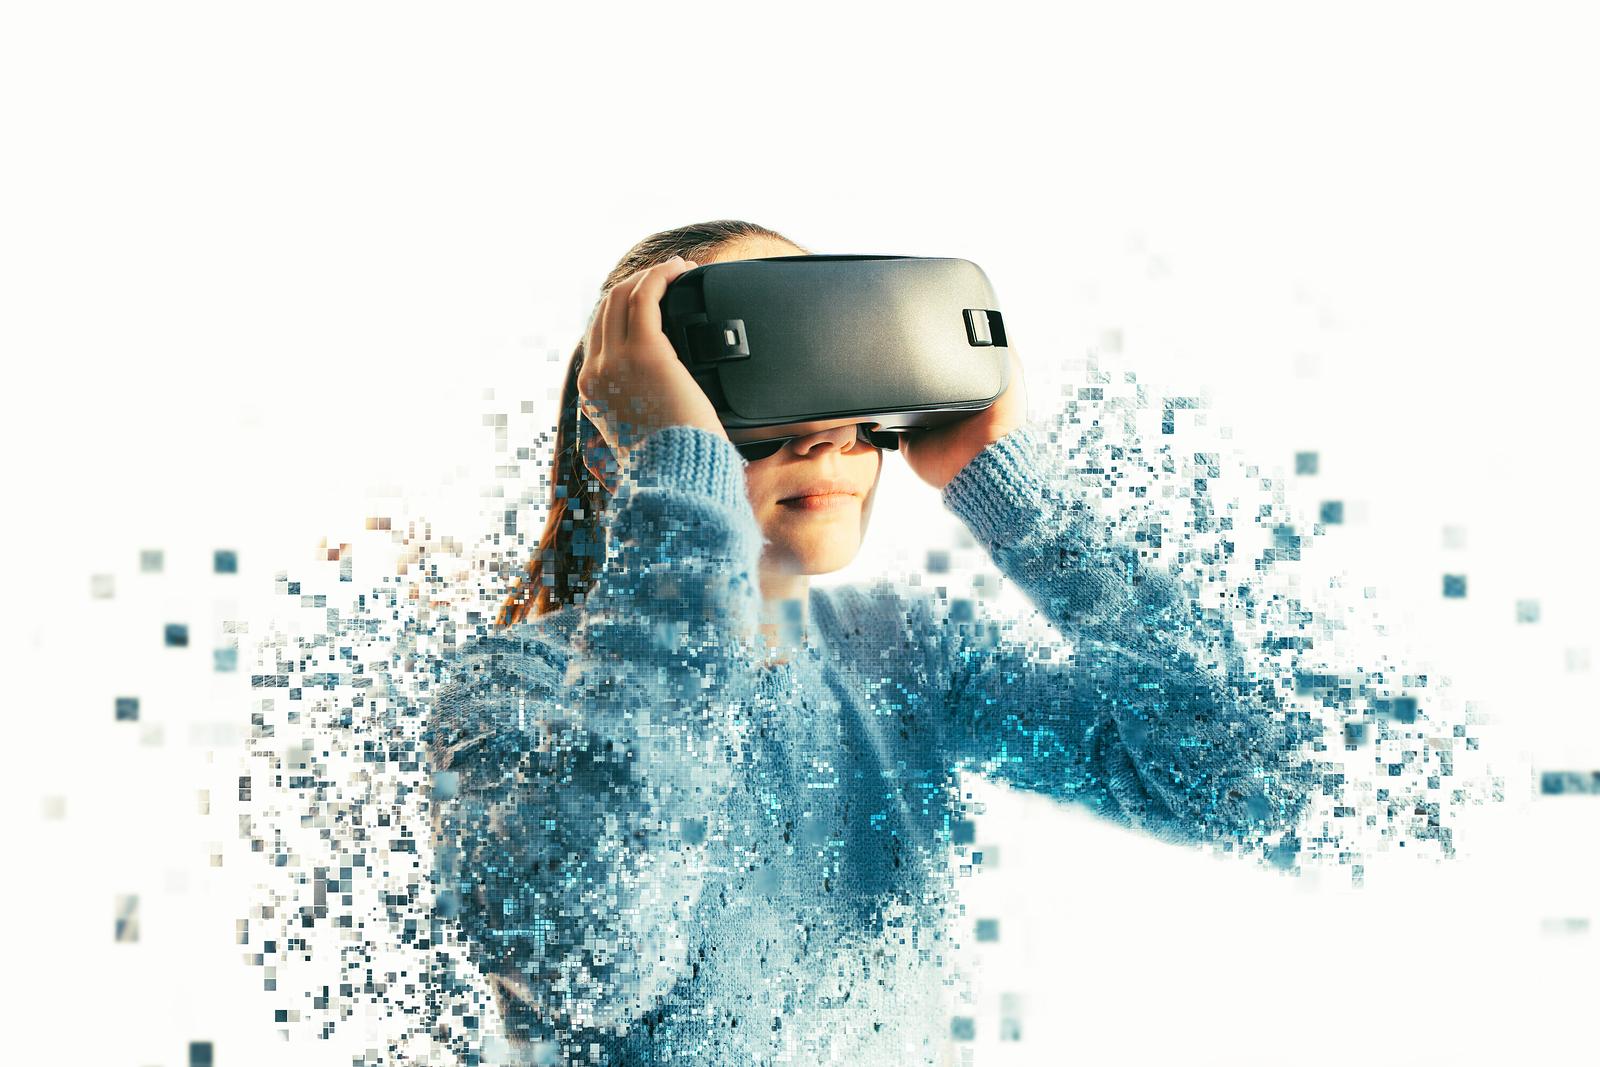 virtual-reality-startups-mainstream-teaser.jpg